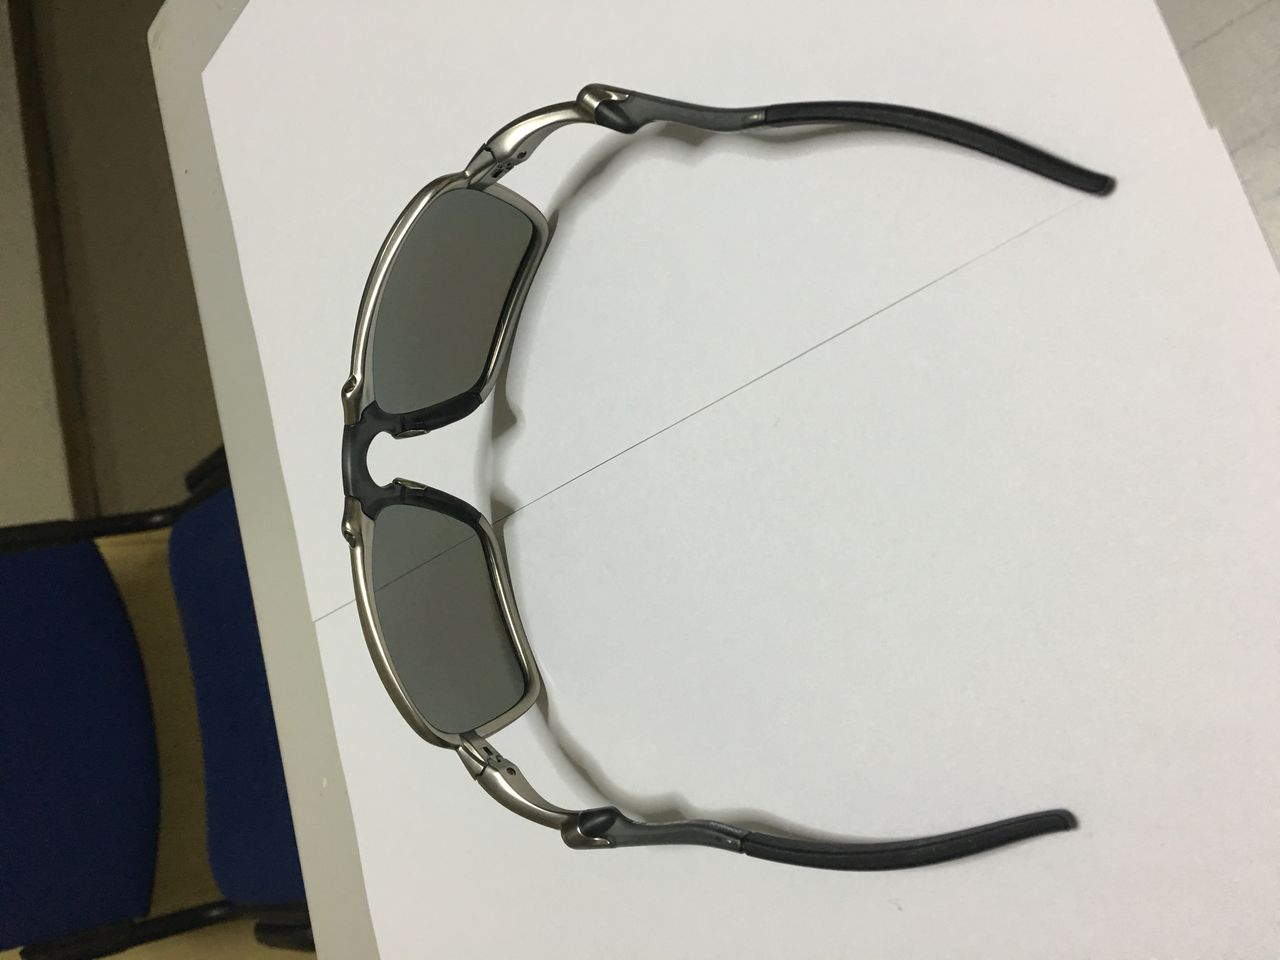 FS: Xsquared, Carbon frame OOBIP sku oo6011-08, Badman Plasma frame with Sapphire lenses - IMG_1388.jpg